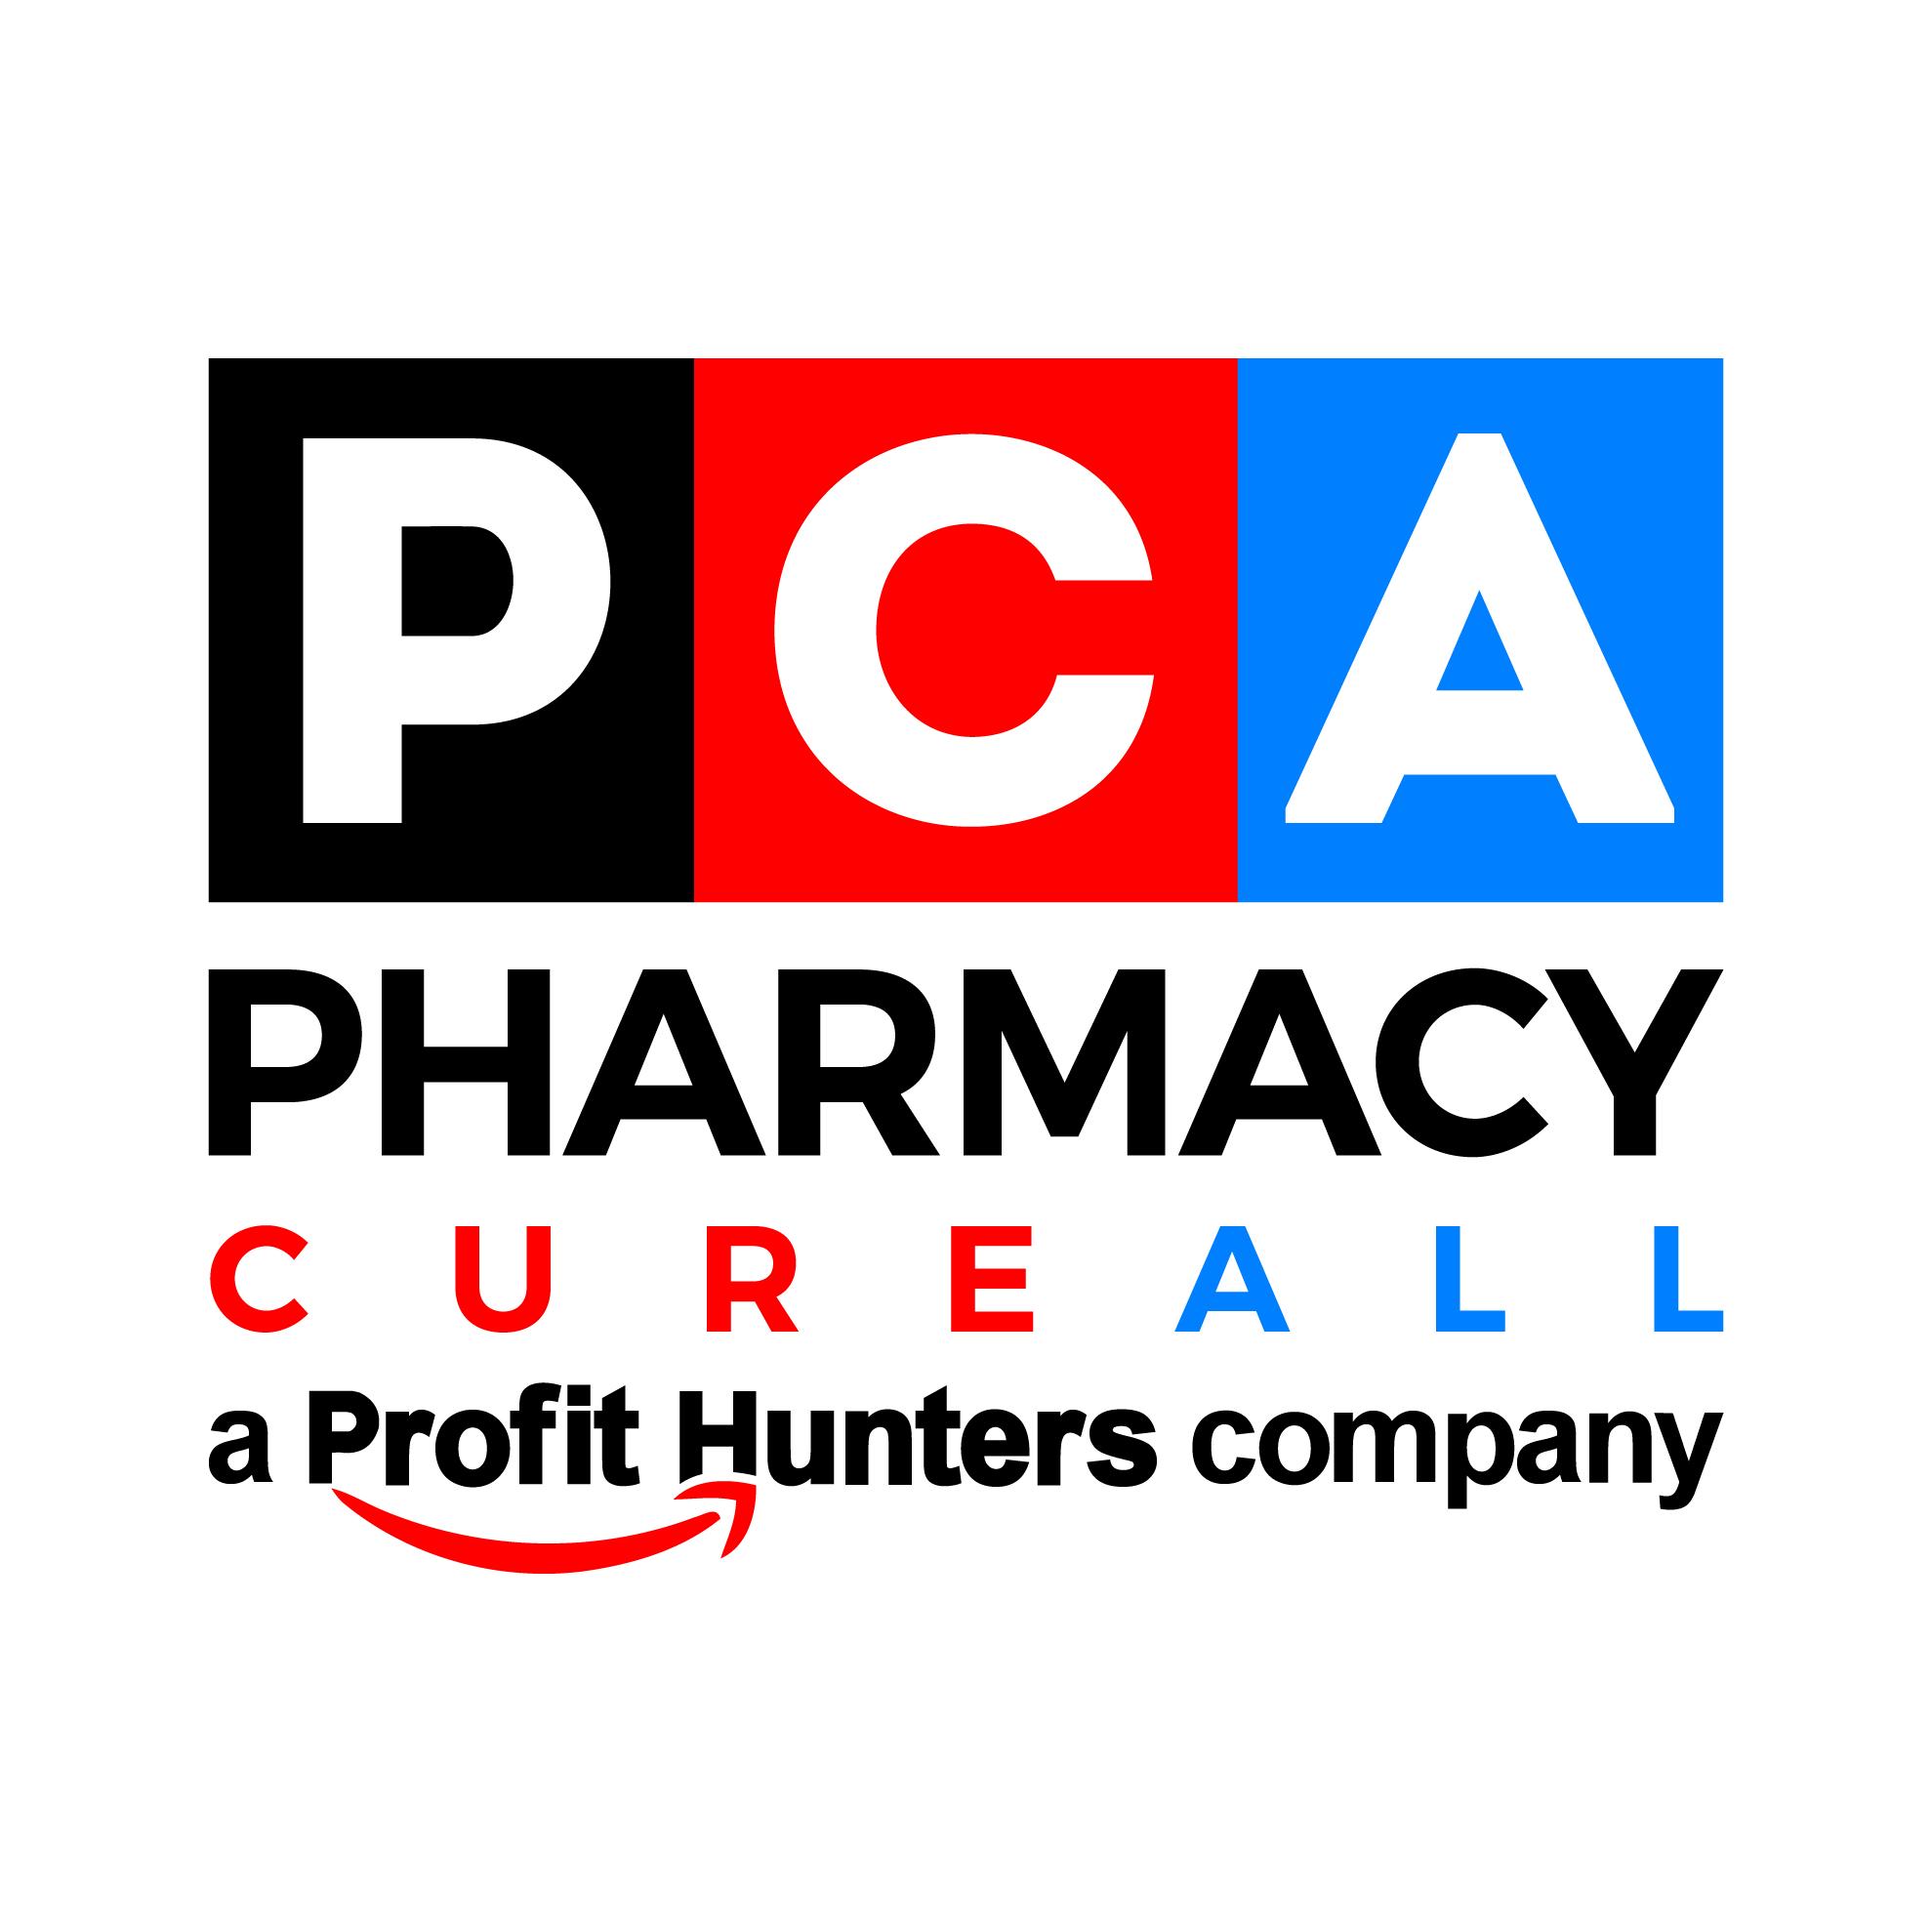 Pharmacy Cure All, LLC